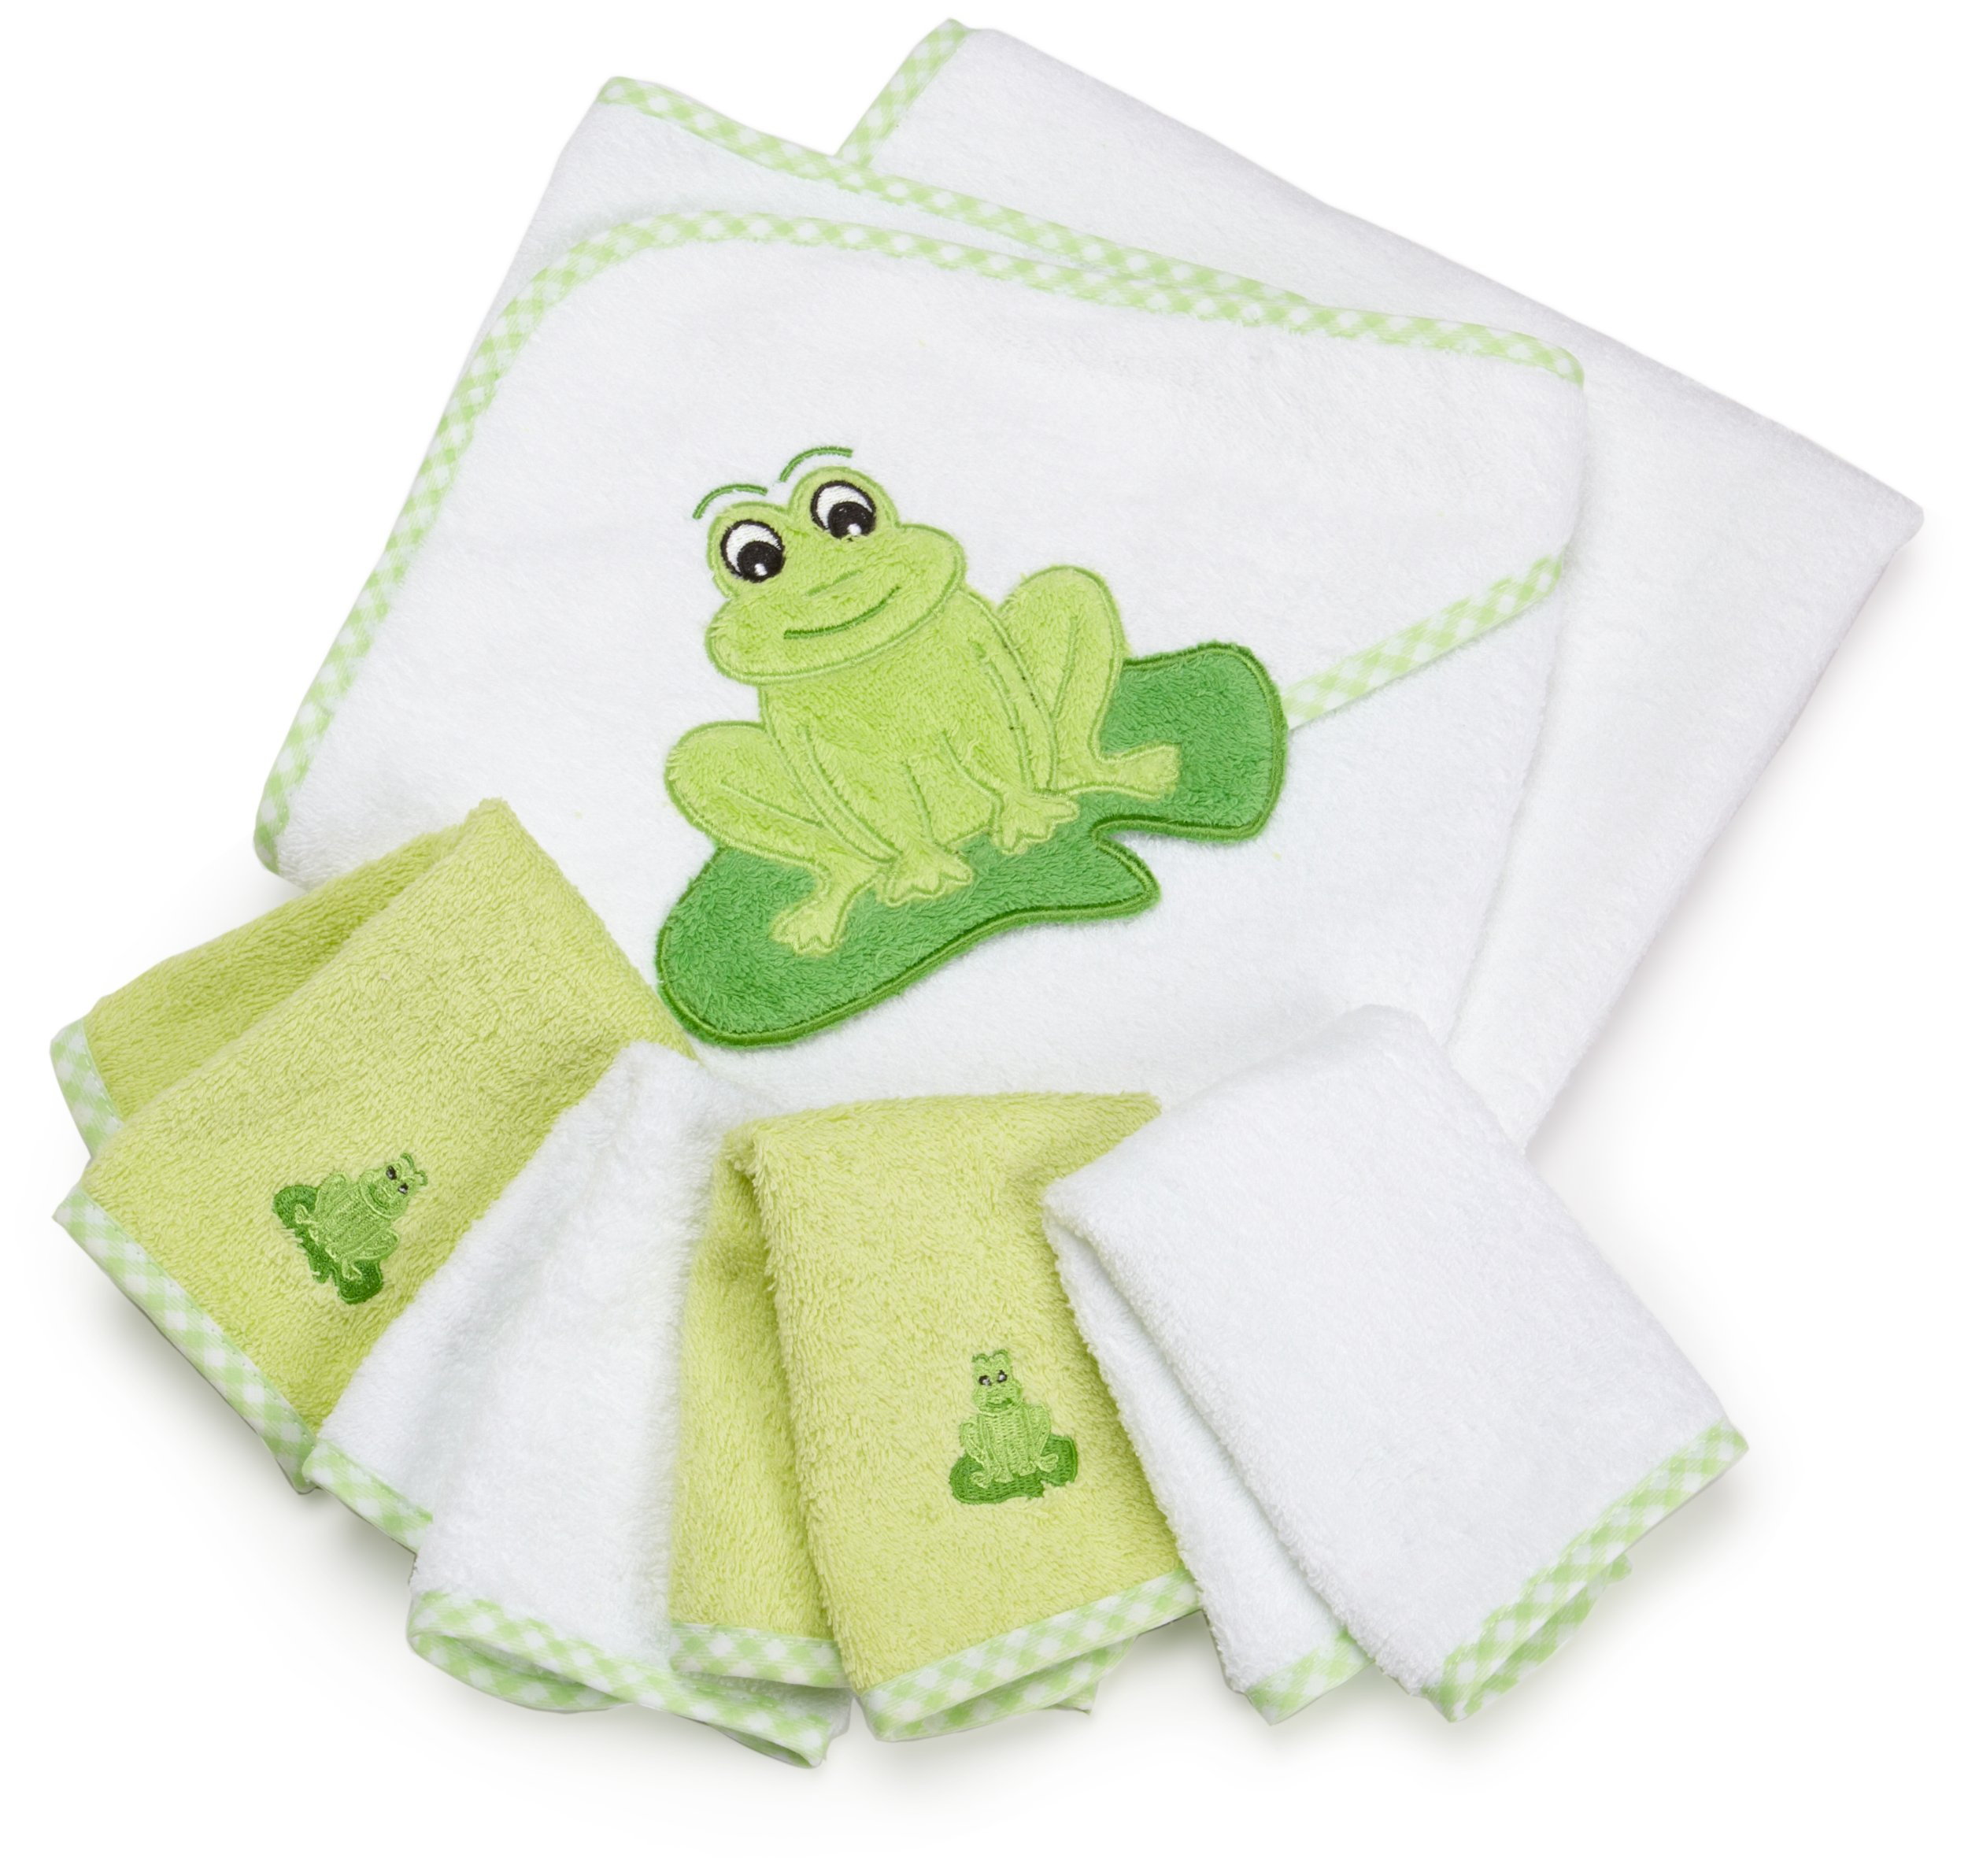 SpaSilk 100% Cotton Hooded Terry Bath Towel with 4 Washcloths, Green by Spasilk